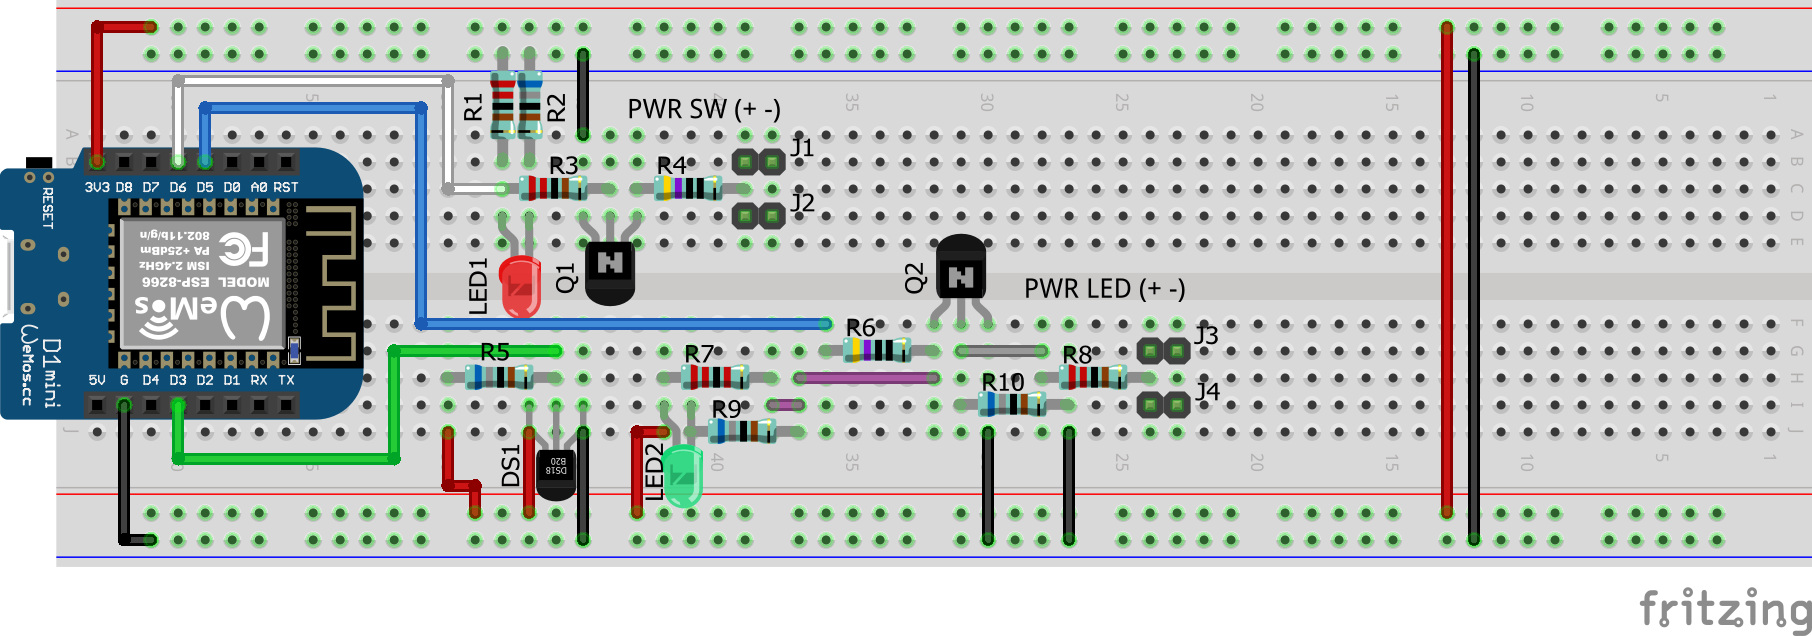 Wemos Esp8266 Remote Pc Switch Usb Header Pinout Likewise Micro Diagram As Well Wiring Esppcsw Bb 33b0li1e7j